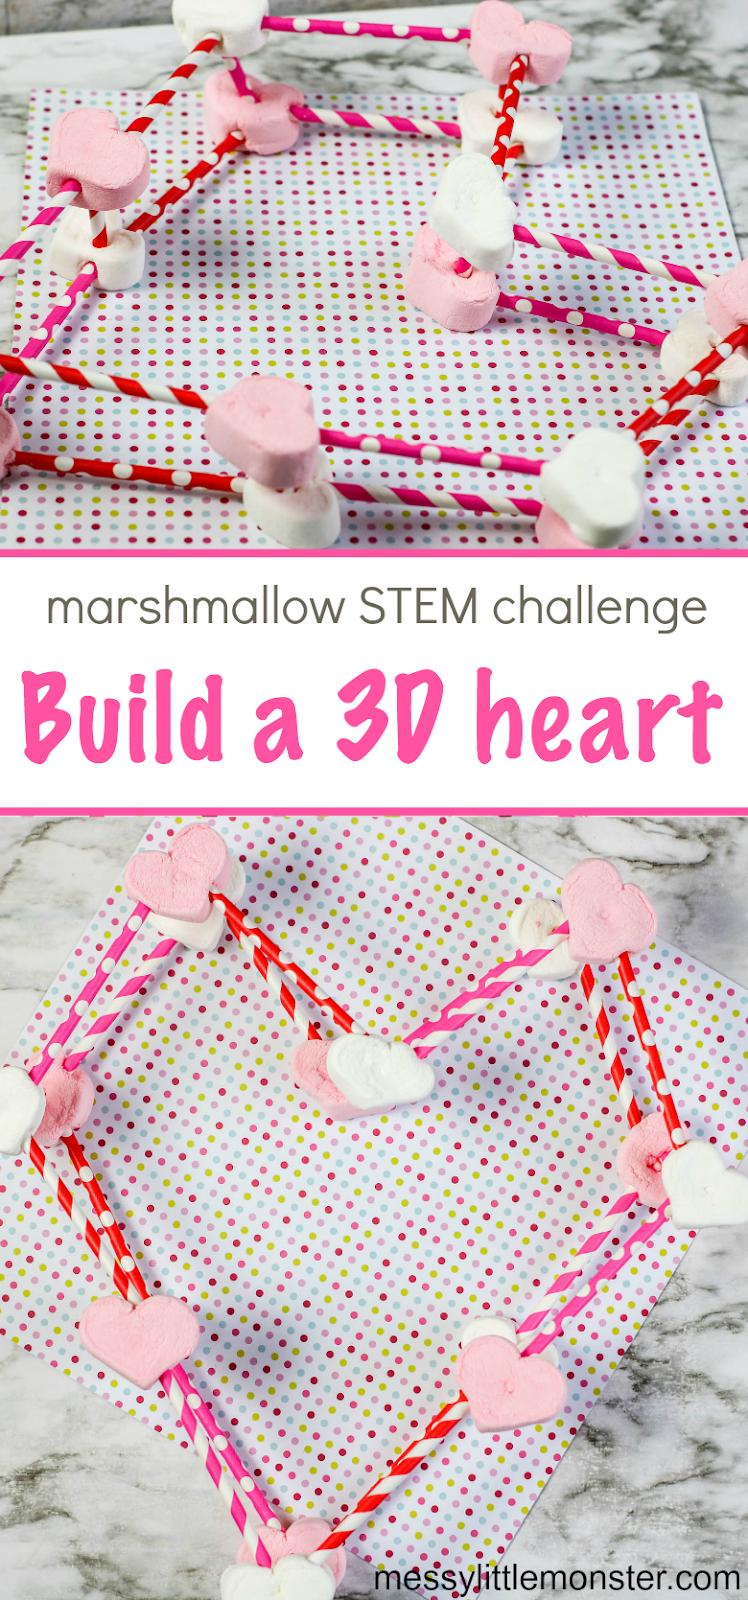 Valentine marshmallow STEM challenge - Make 3D heart marshmallow structures.